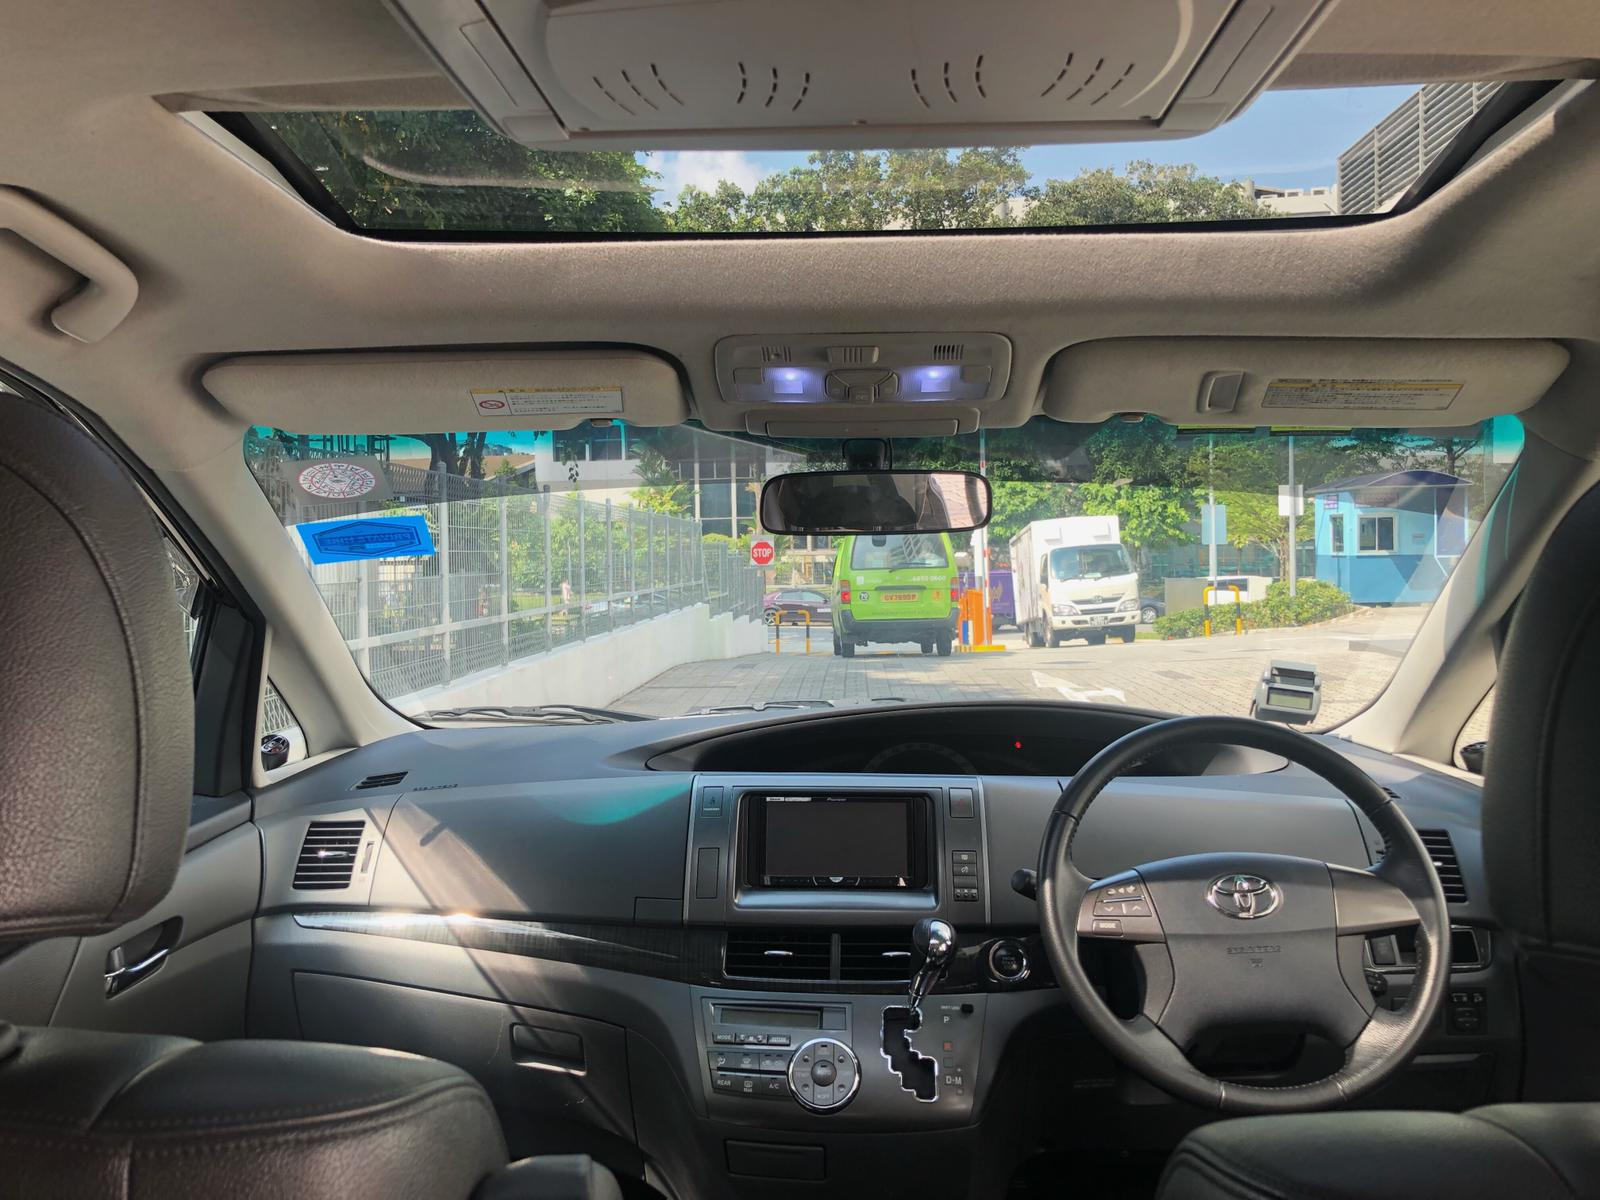 Toyota Estima MPV Stream Cars Hyundai Avante Mazda 3 2 For Rent Grab Rental Gojek Or Personal Use Low price and Cheap